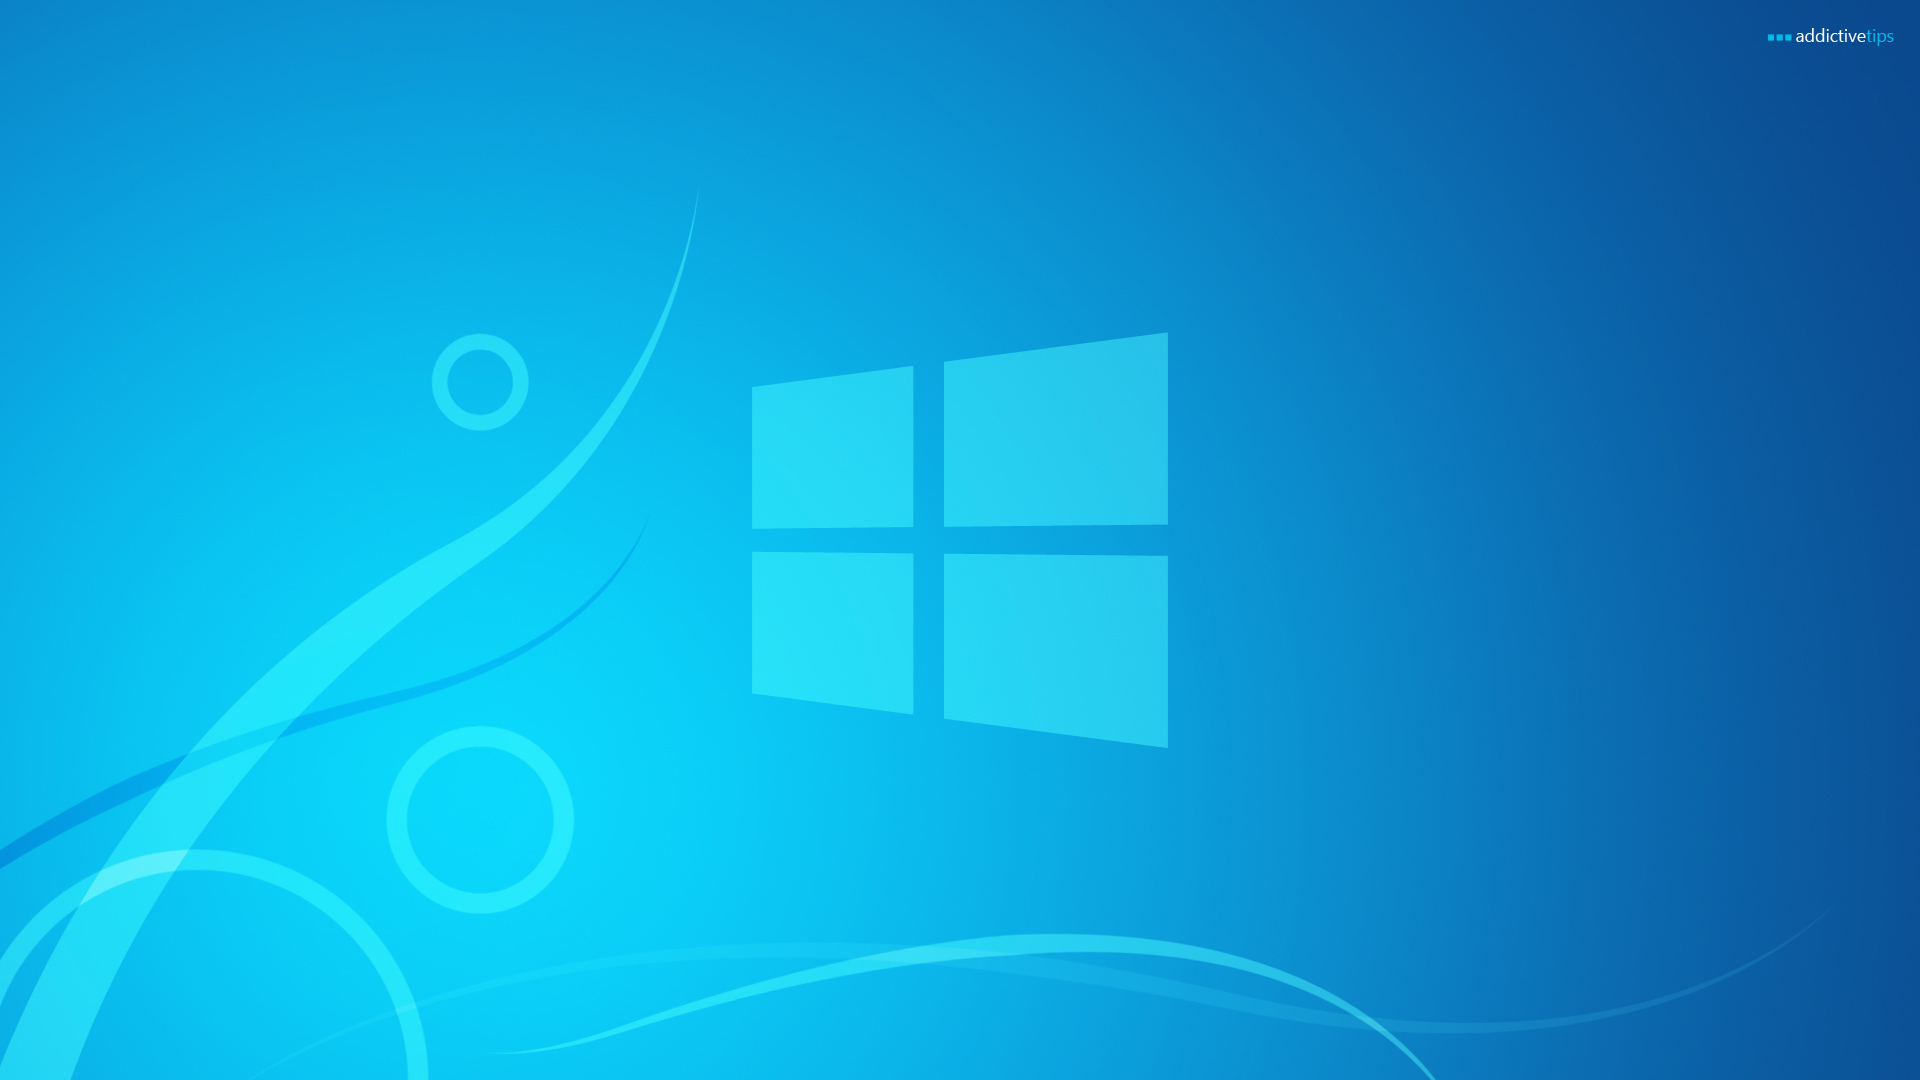 Desktop wallpaper for windows 8 1